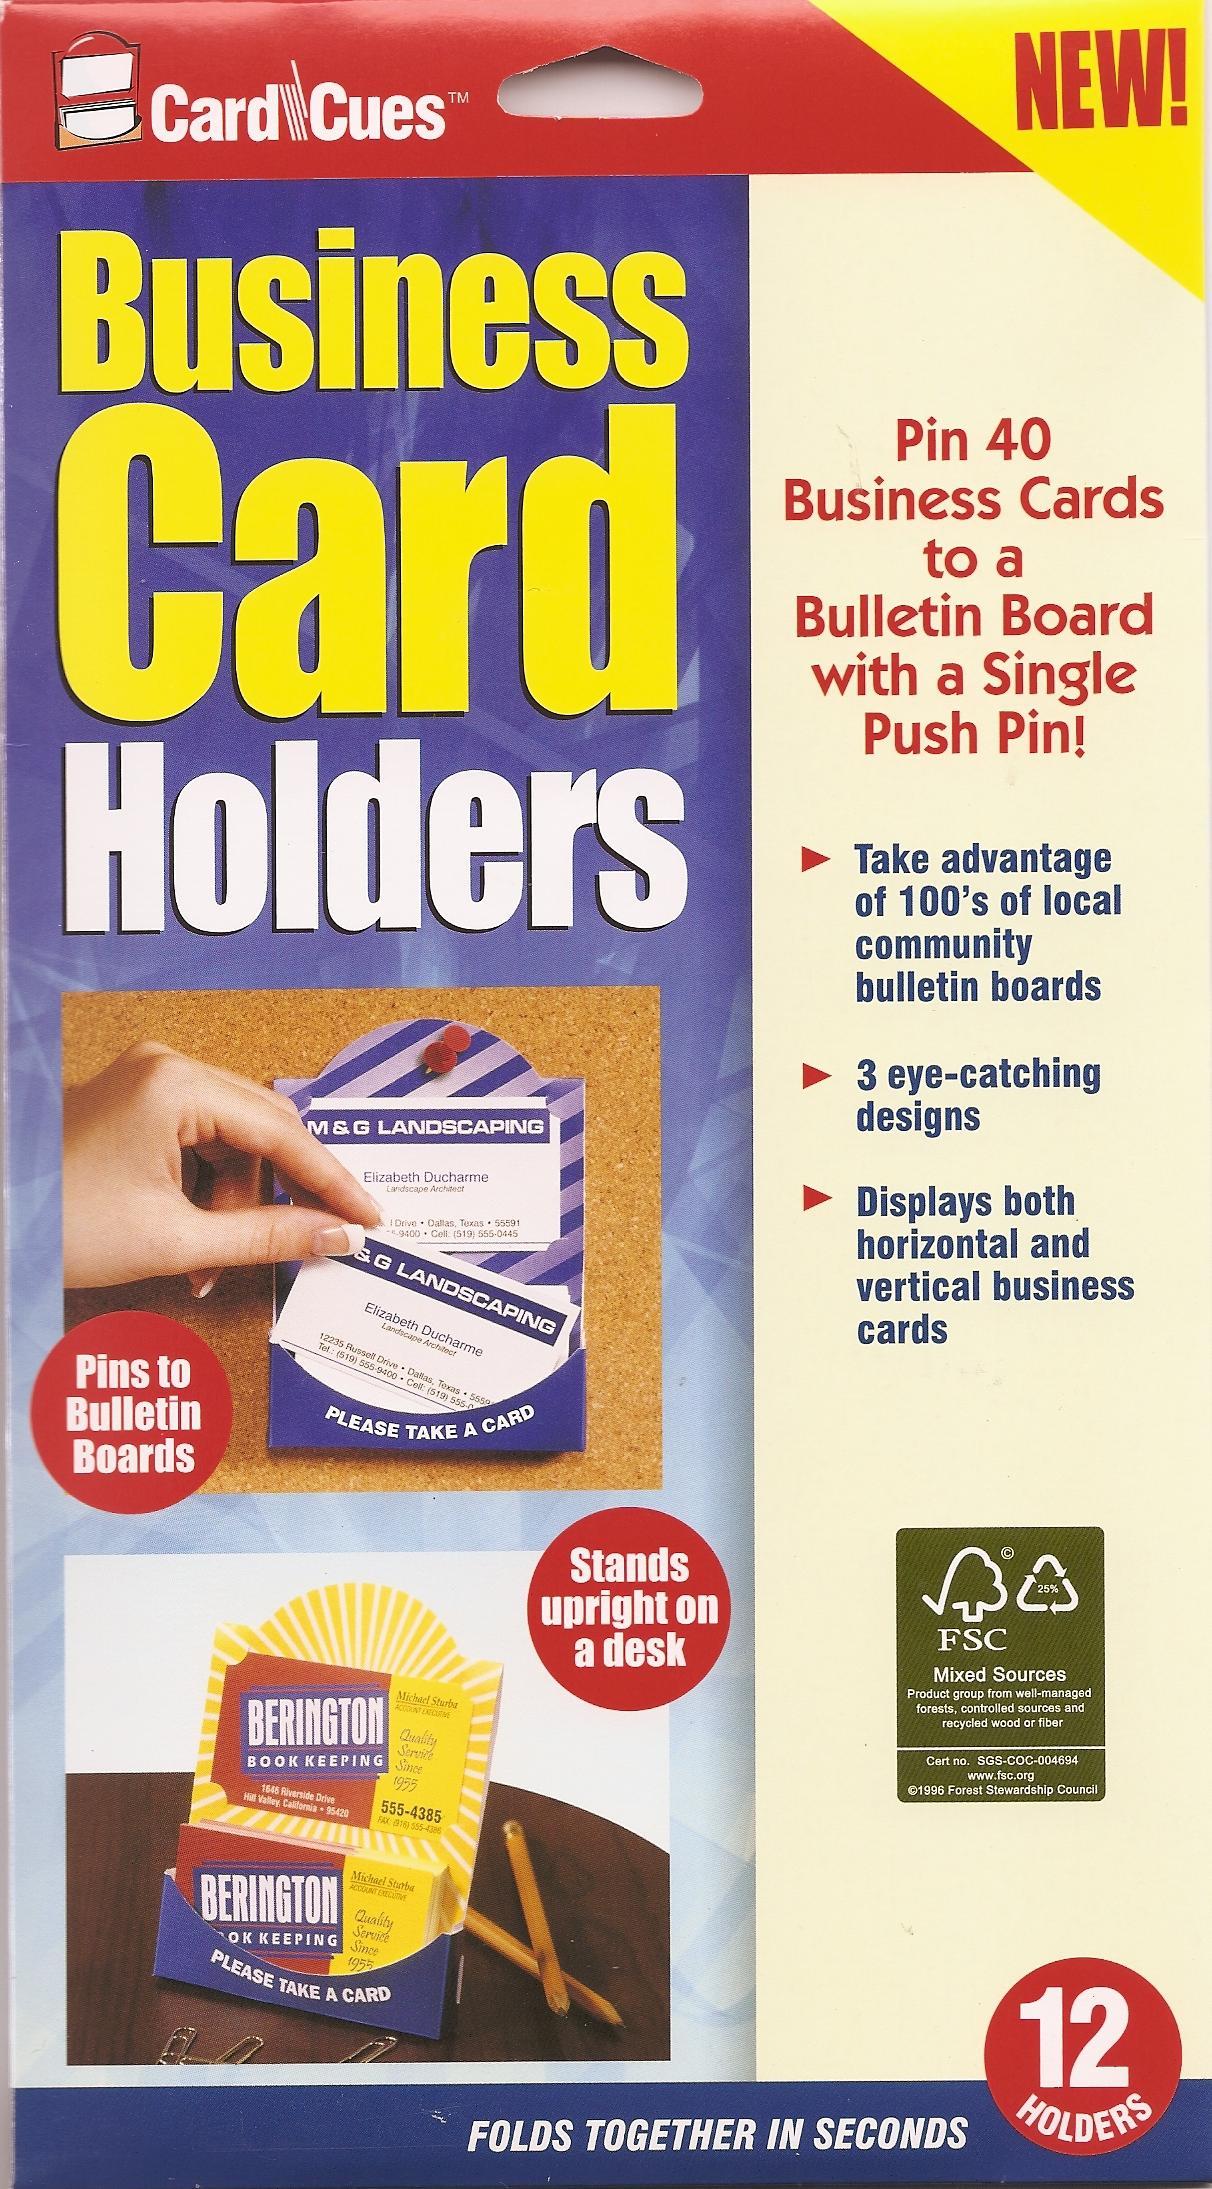 Clear Lake Enterprises: CardCues